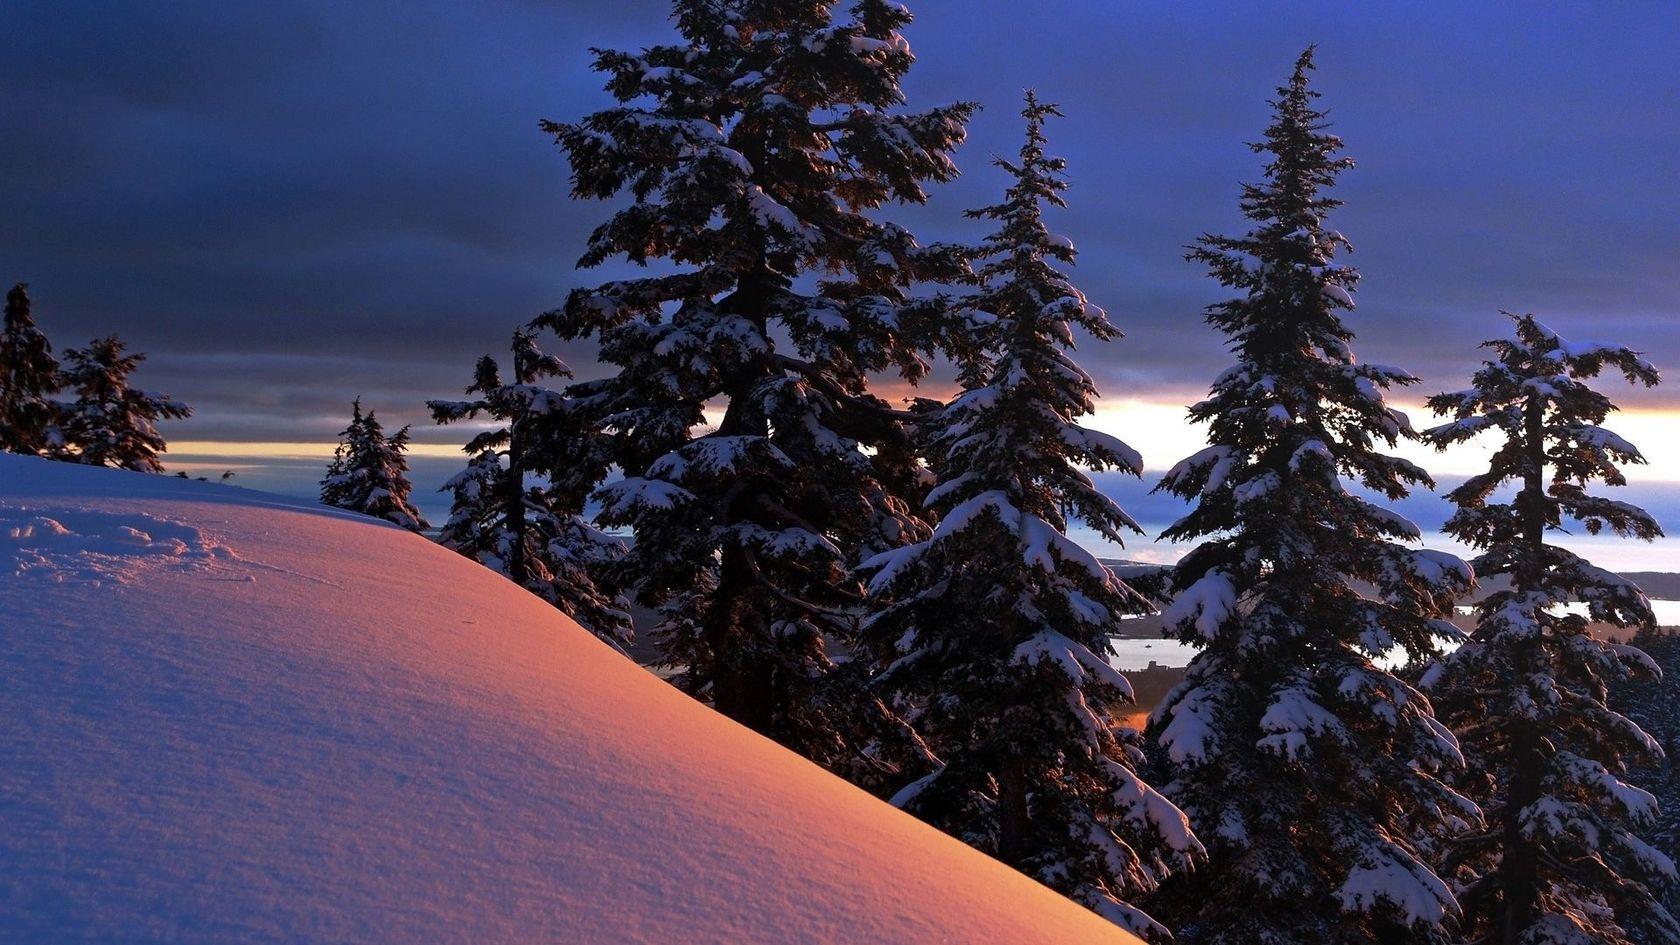 snowy trees wallpaper 32384